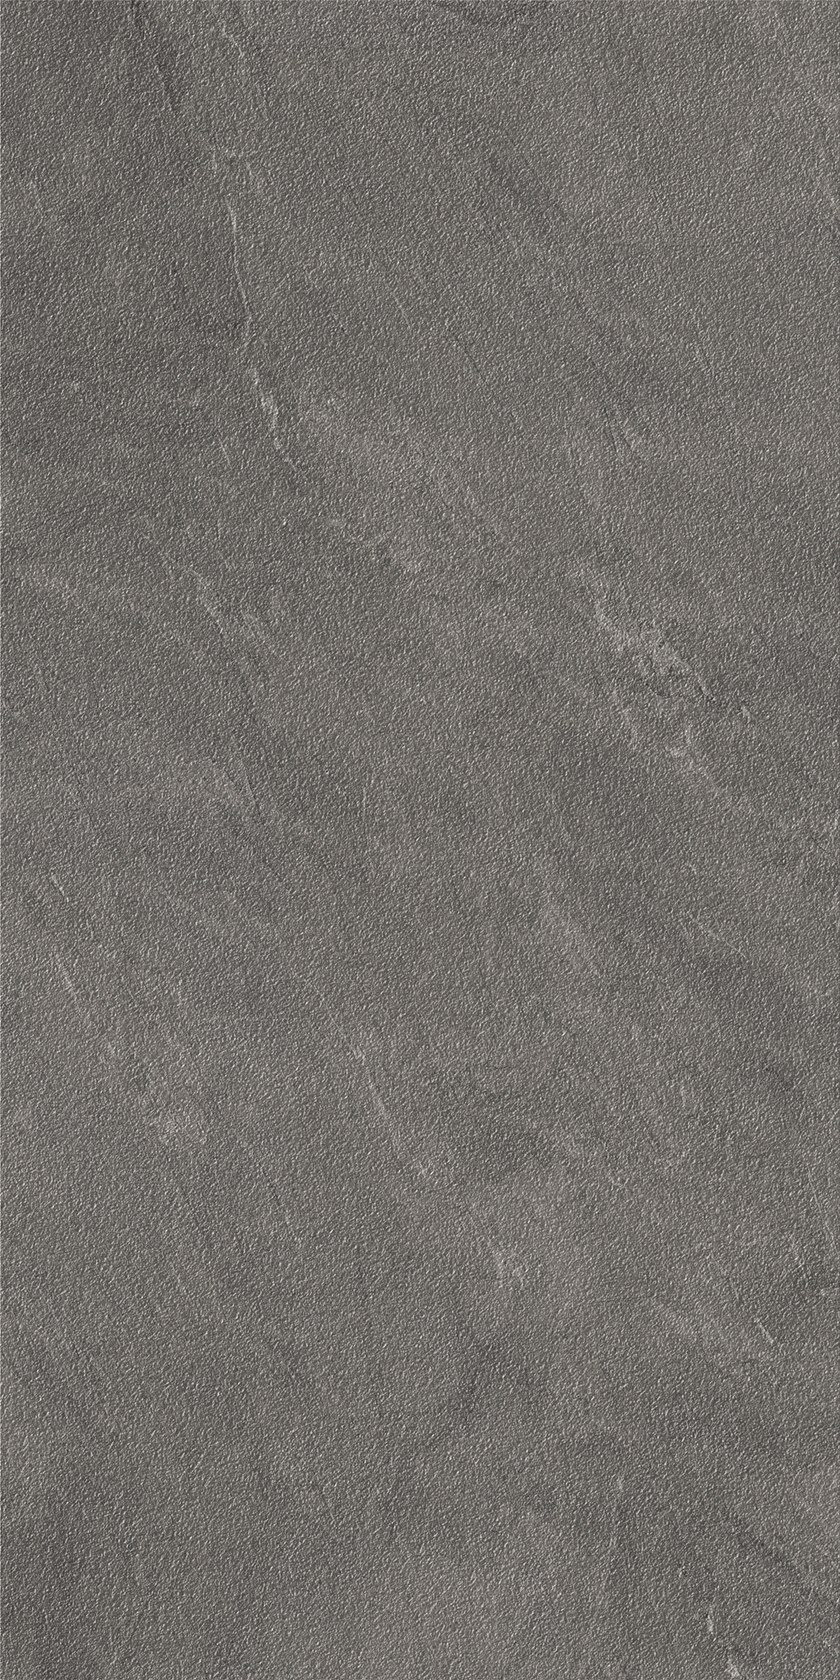 Pacific Gris Abujardado / Bush-hammered 150x300 cm